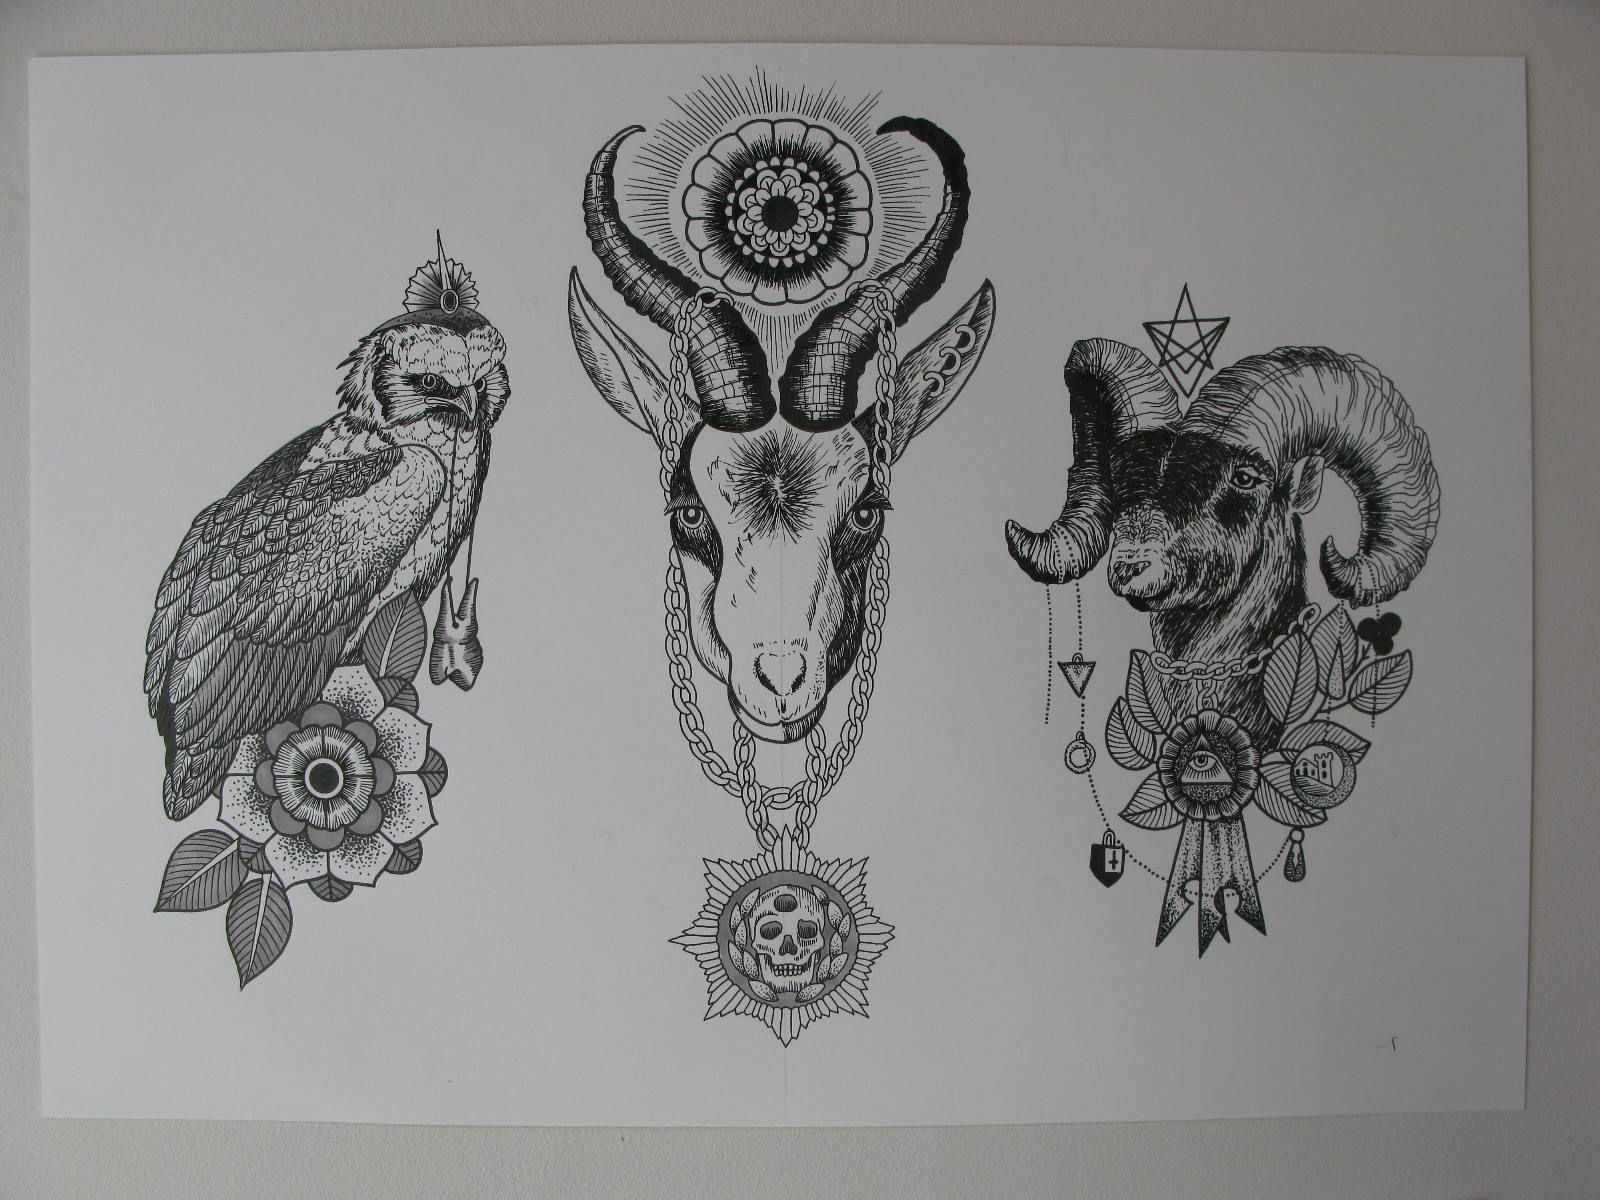 geometric animal tattoo designs new flash my tattoo inspiration pinterest animal tattoos. Black Bedroom Furniture Sets. Home Design Ideas